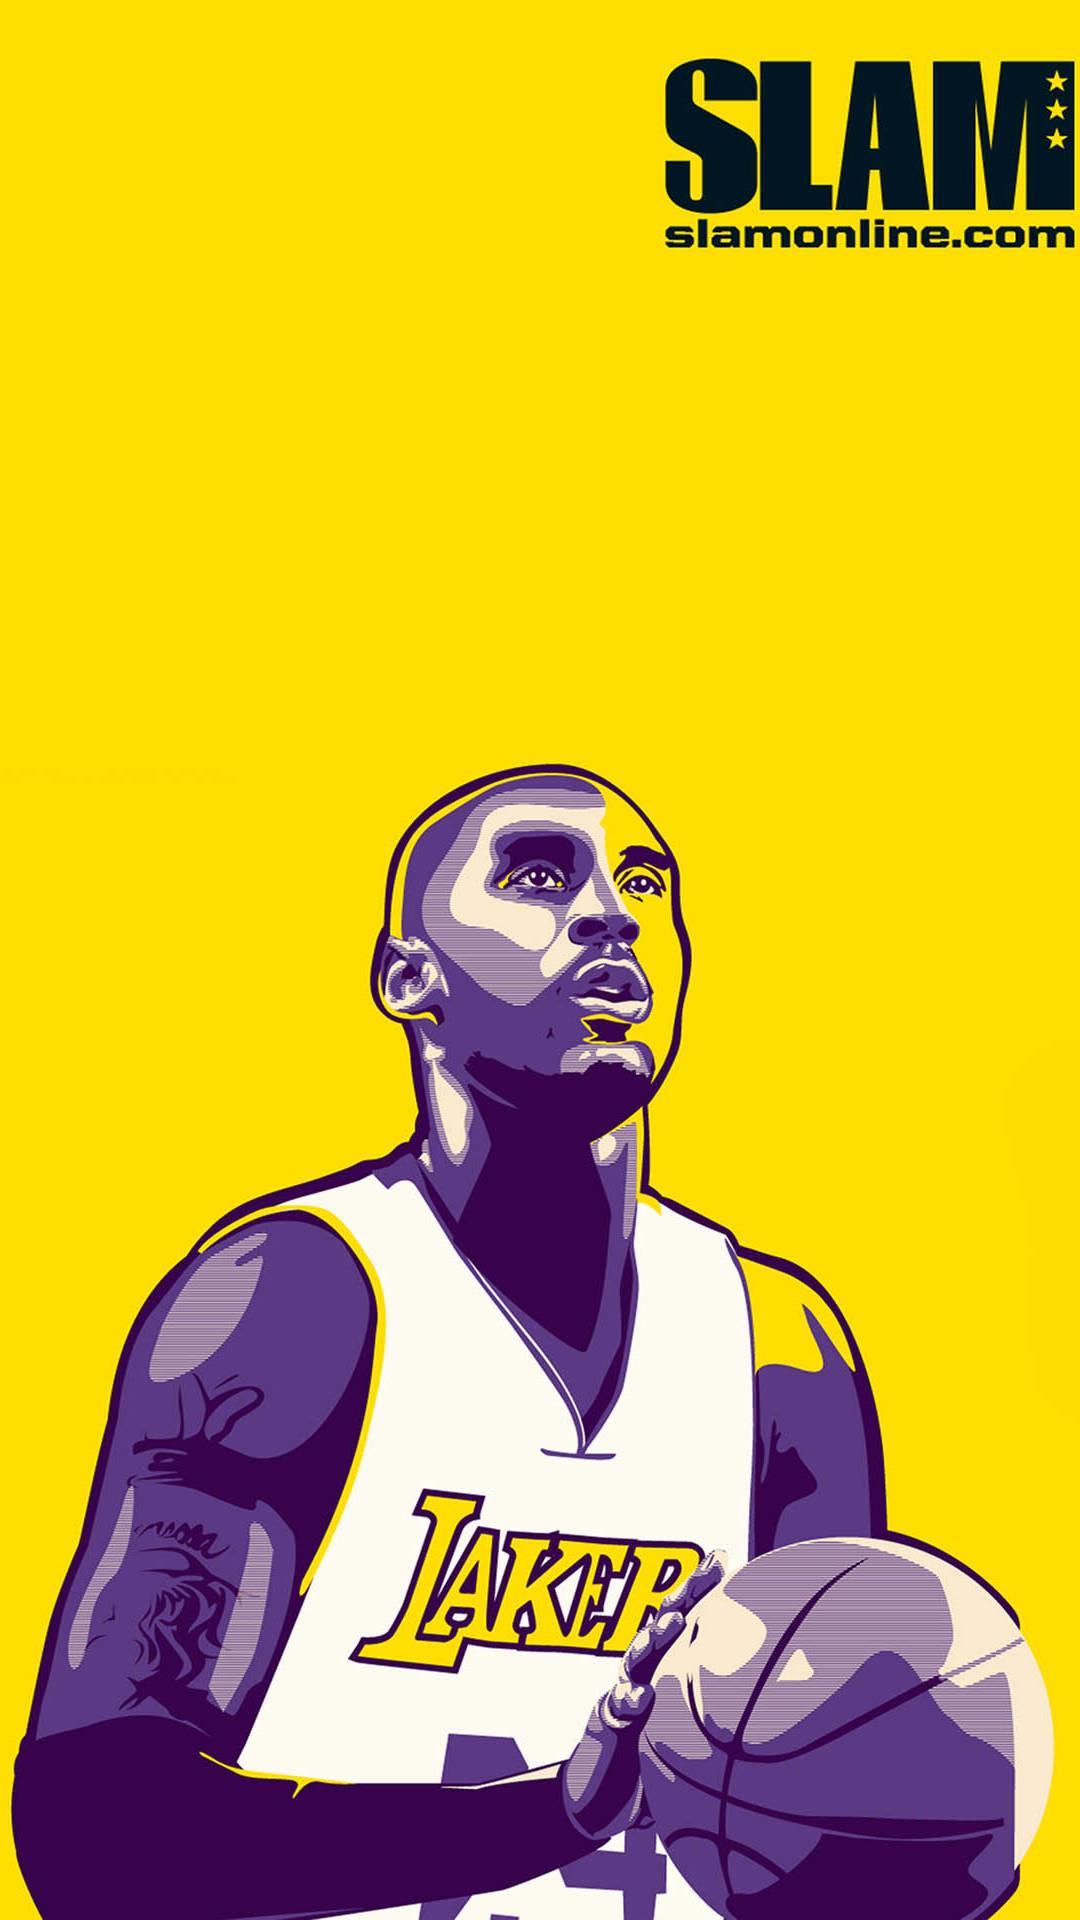 Animated Kobe Bryant Wallpaper : animated, bryant, wallpaper, Cartoon, Bryant, Wallpapers, Wallpaper